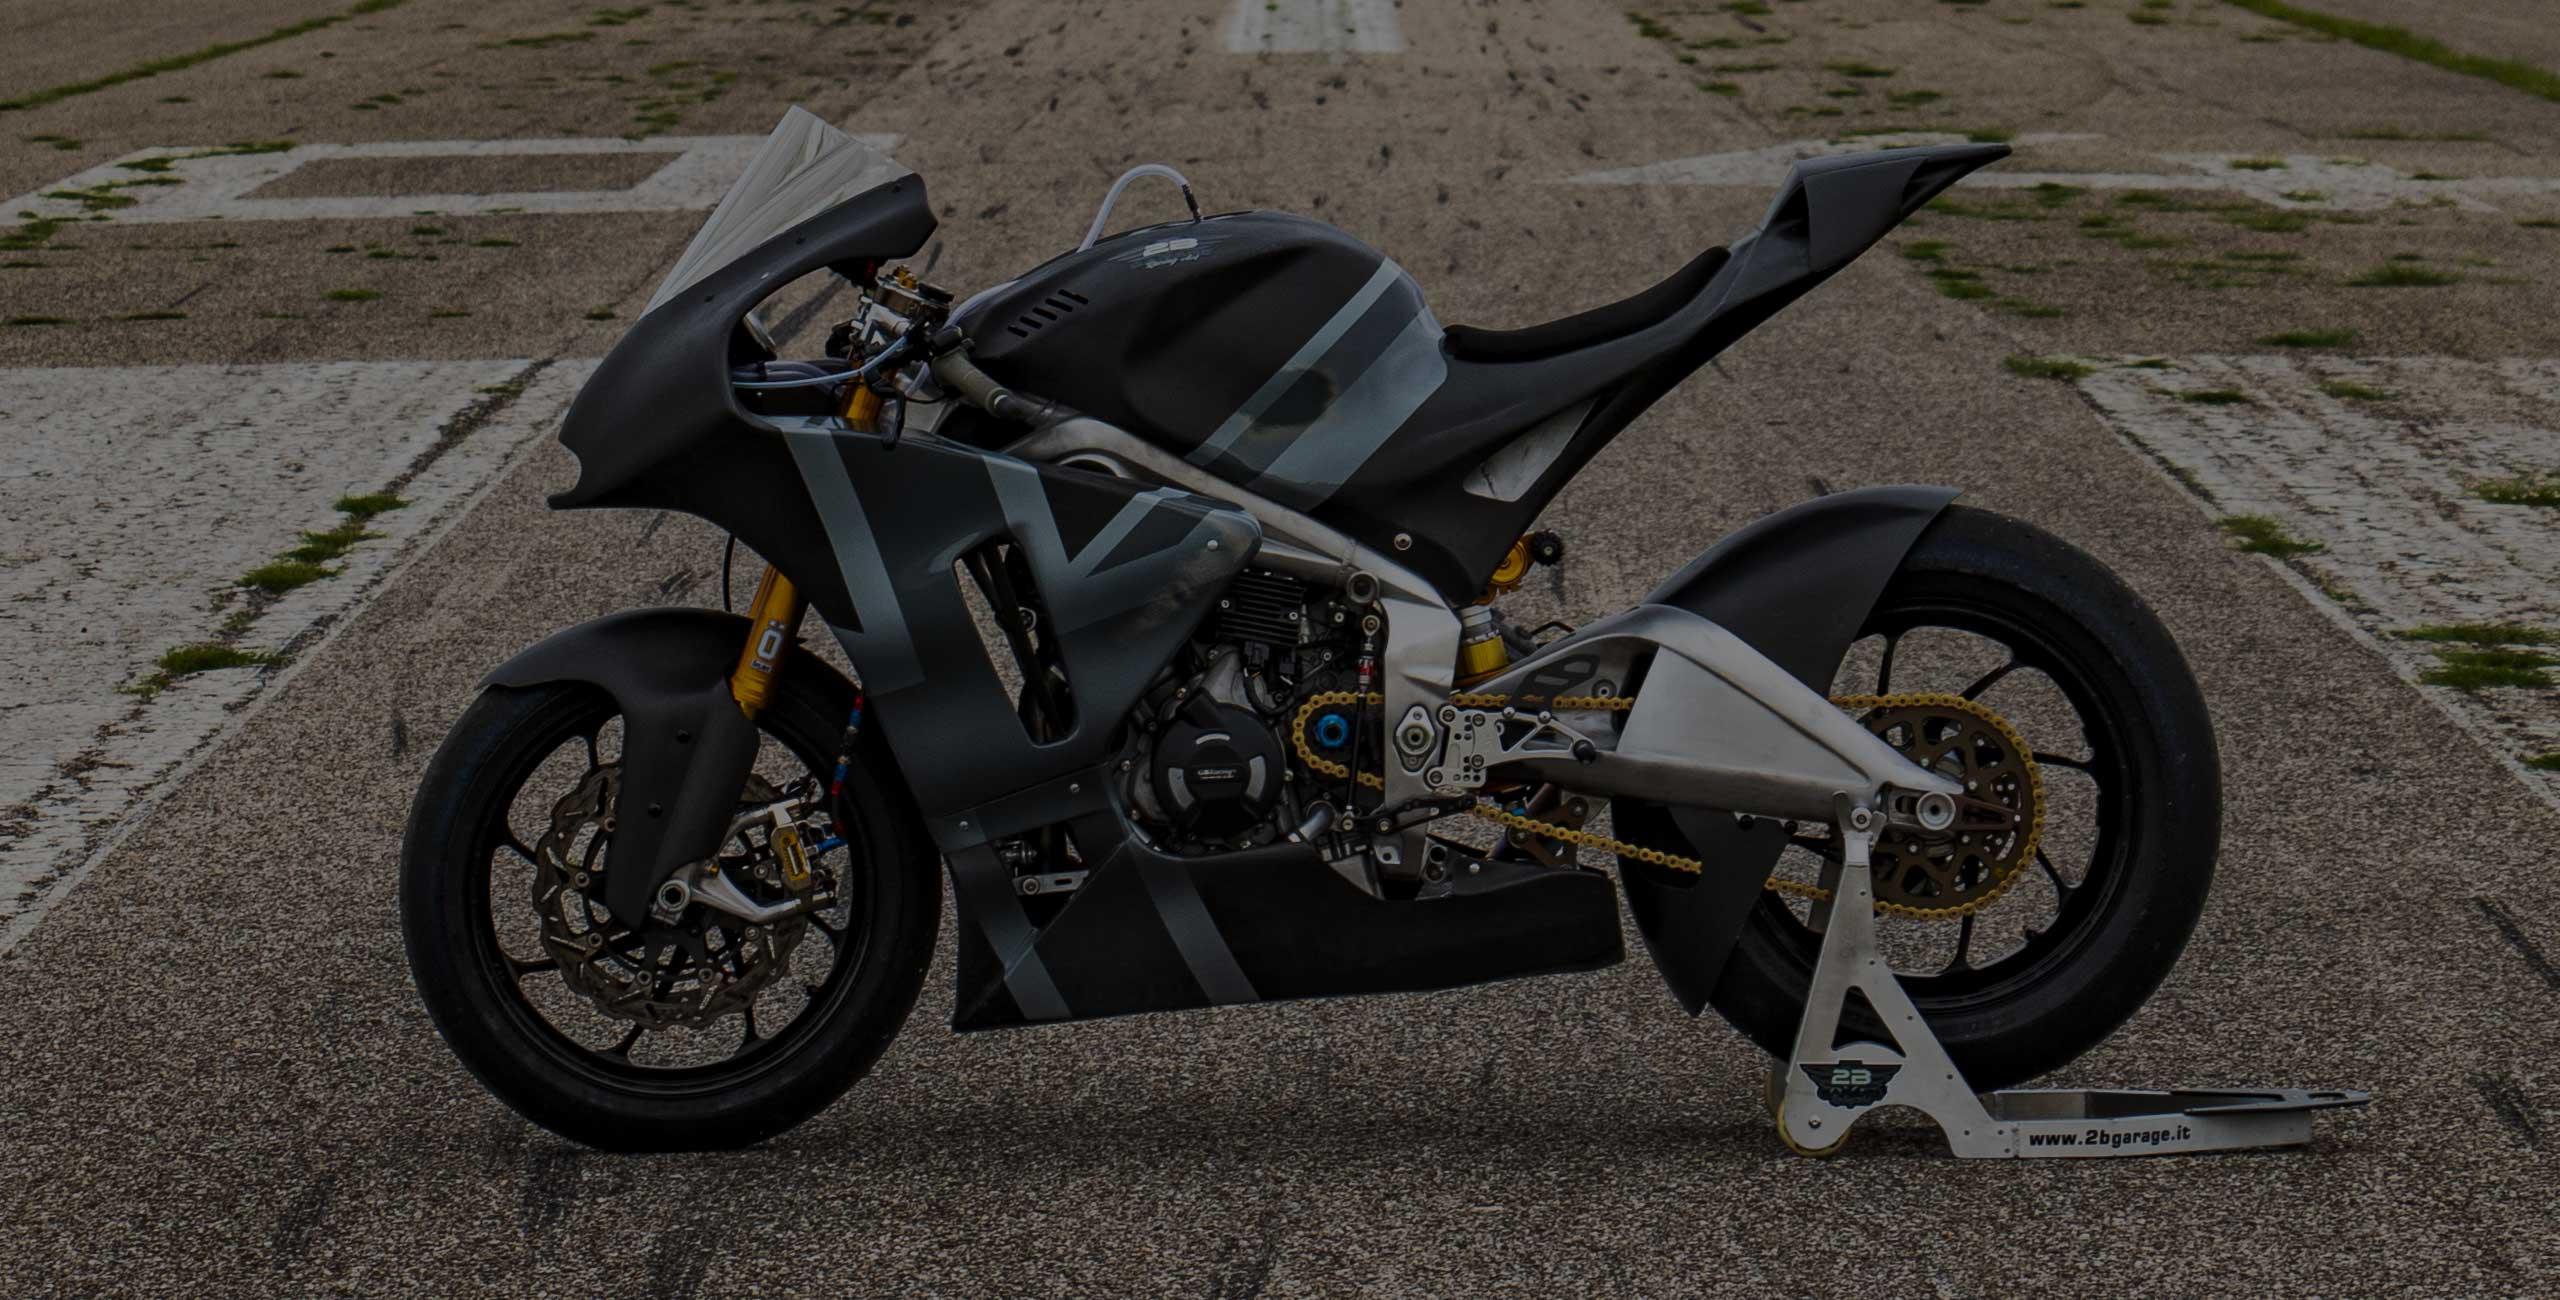 2B-Garage-Triumph-765-motor-prototype-moto-2